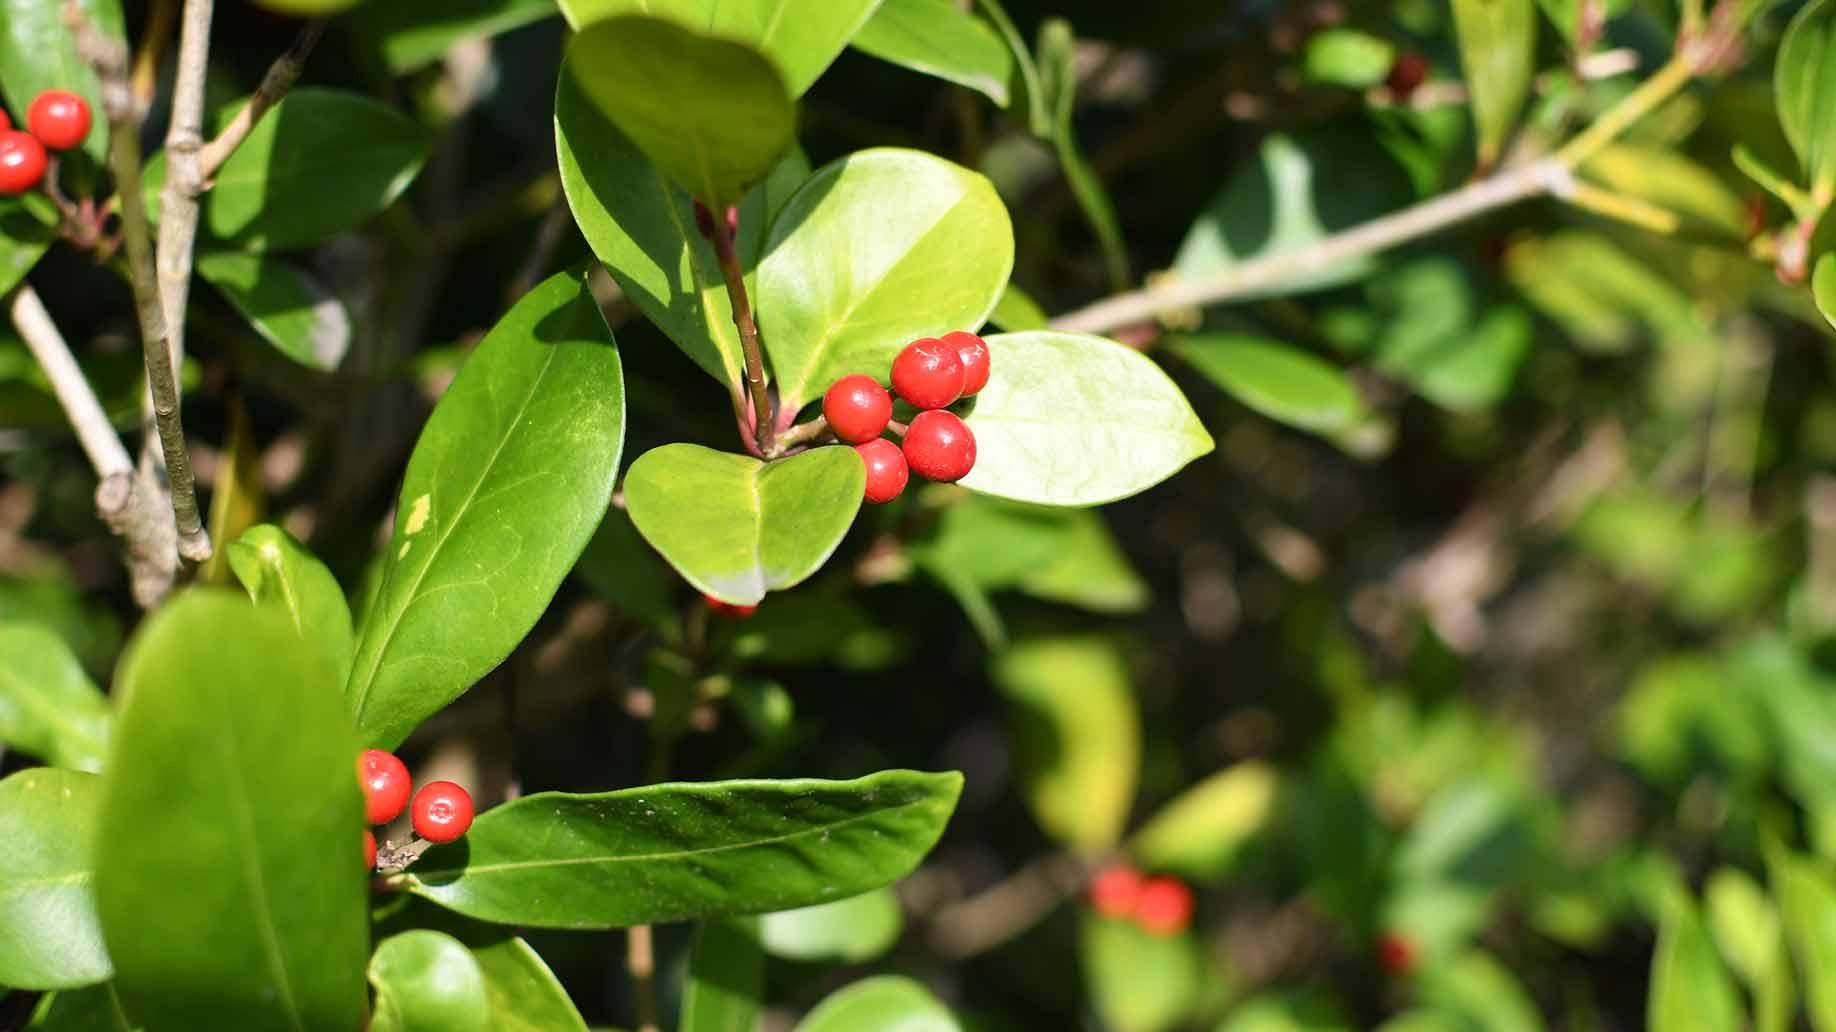 uva ursi bearberry red berries urinary tract infection uti natural remedies